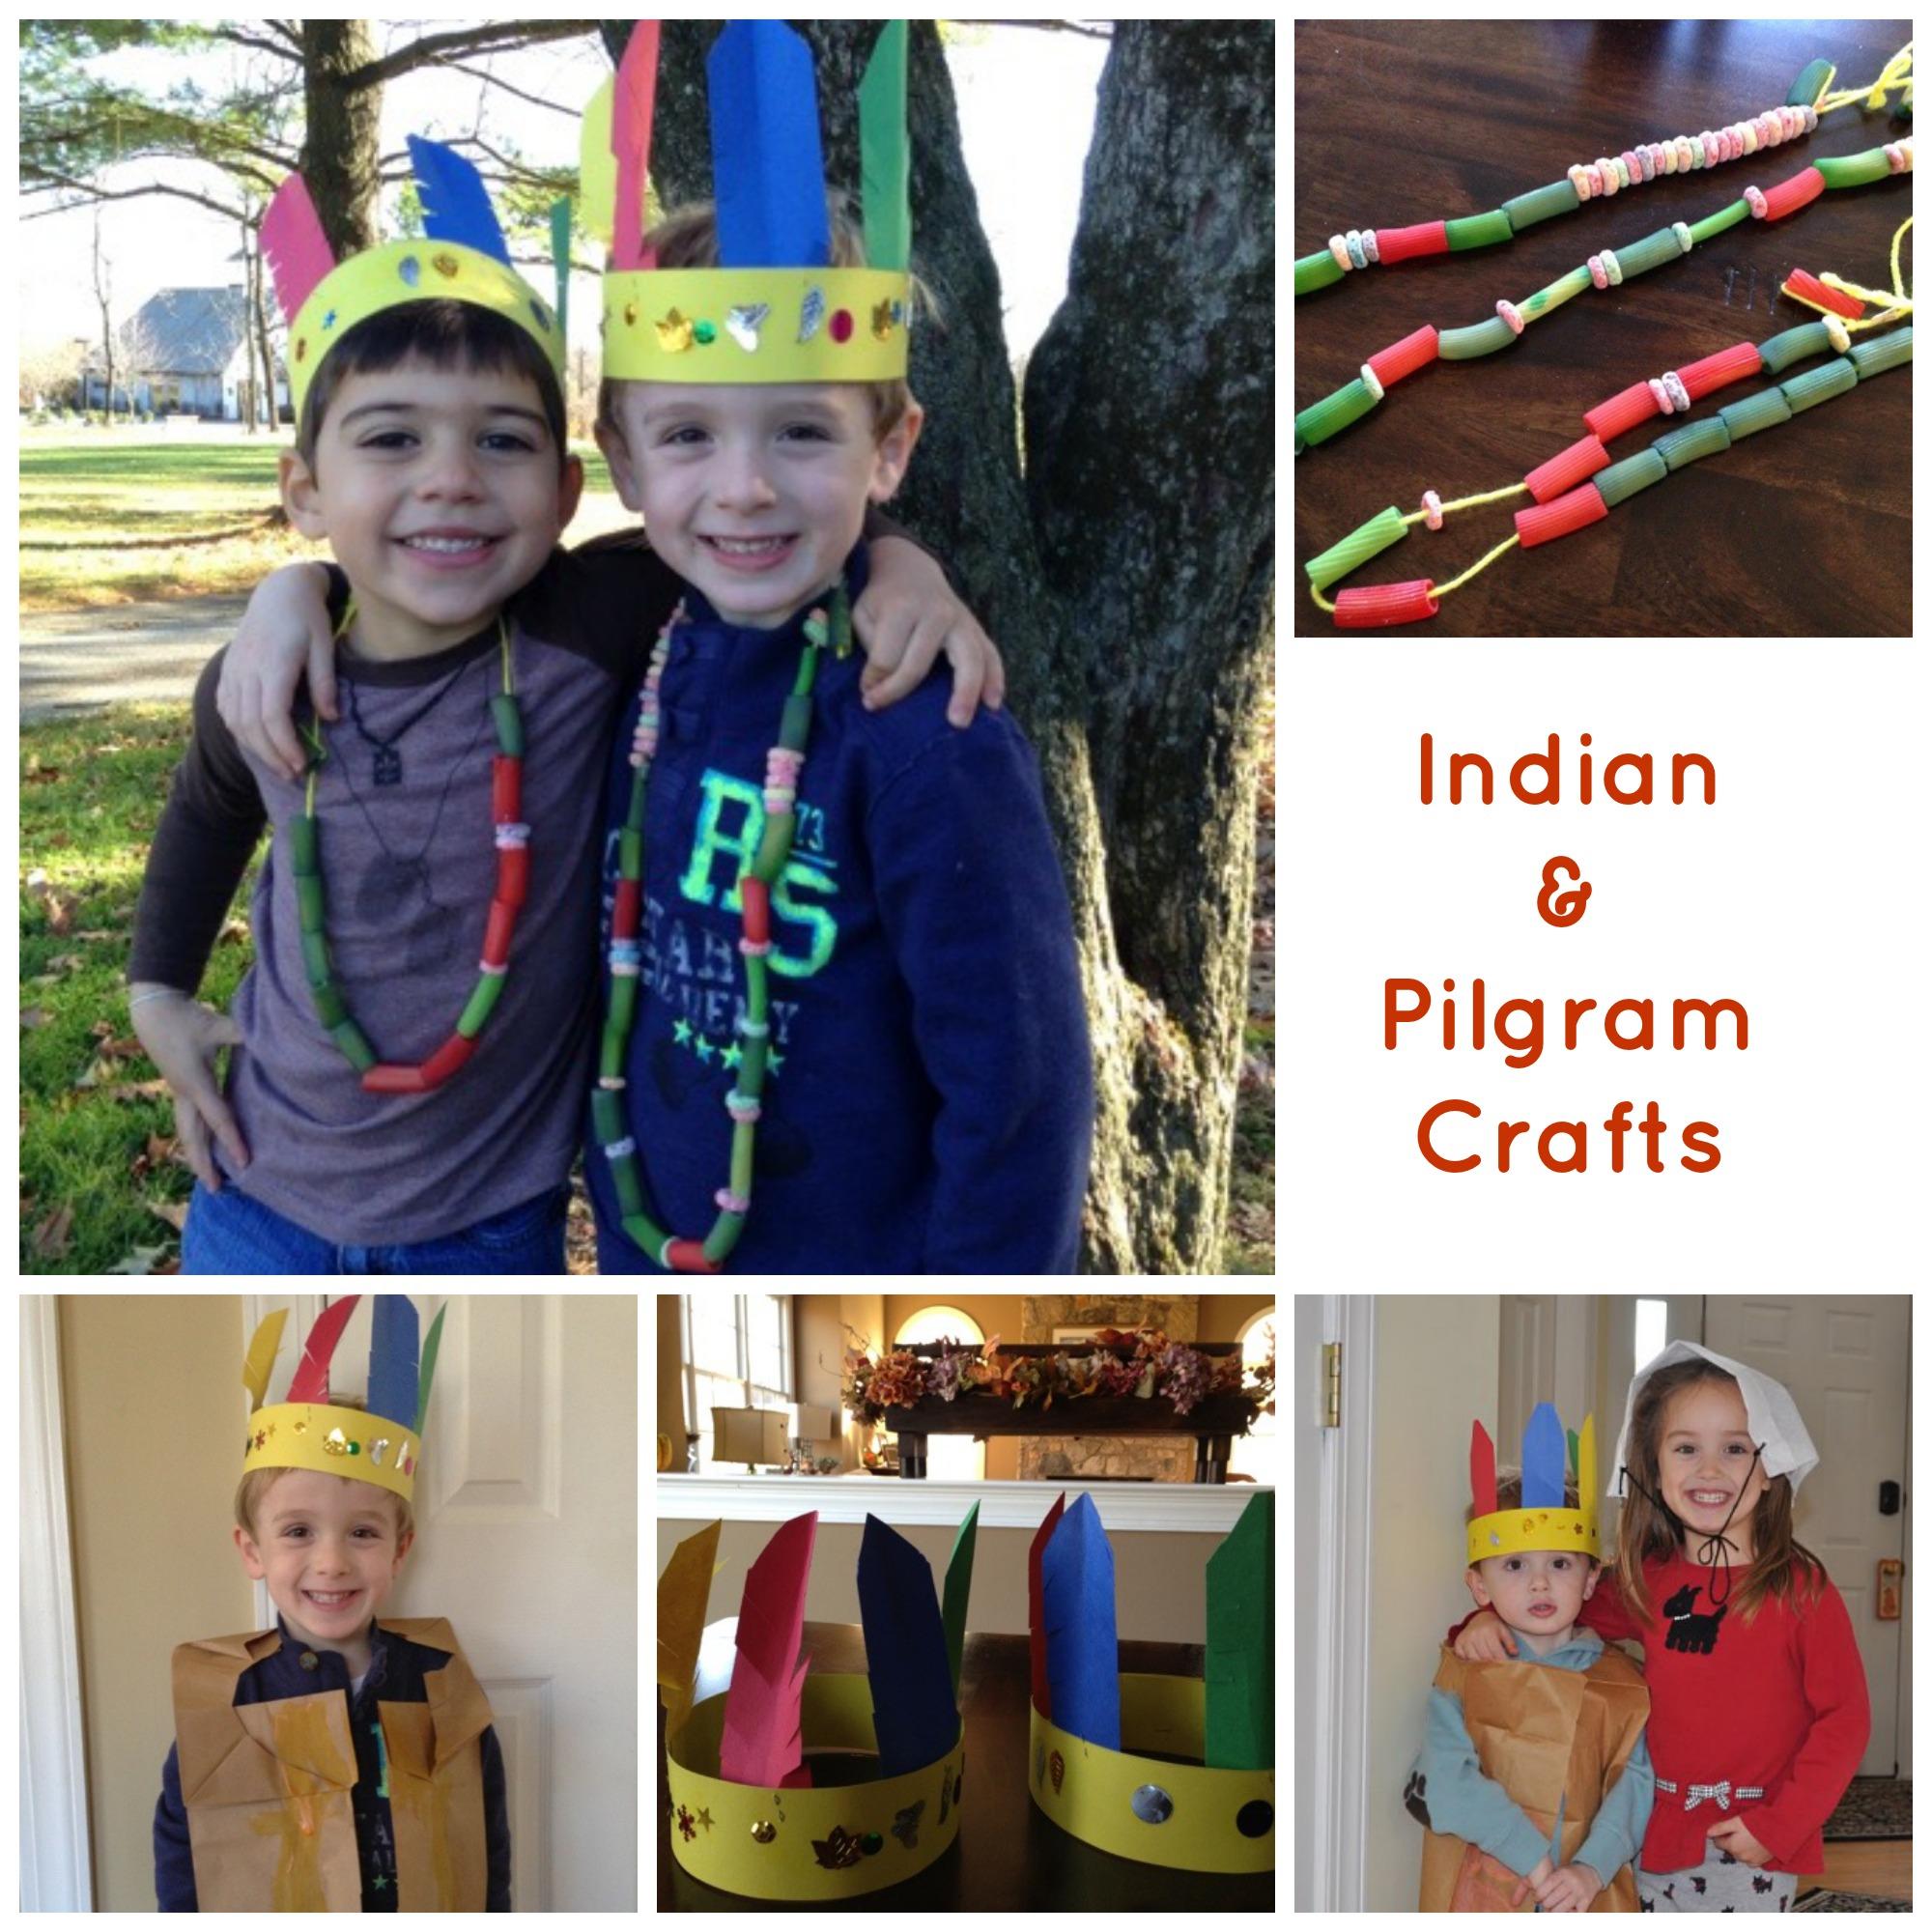 Easy diy indian headdress clublifeglobal diy native indian headdress clublilobal com easy homemade indian and pilgrim crafts for kids solutioingenieria Choice Image